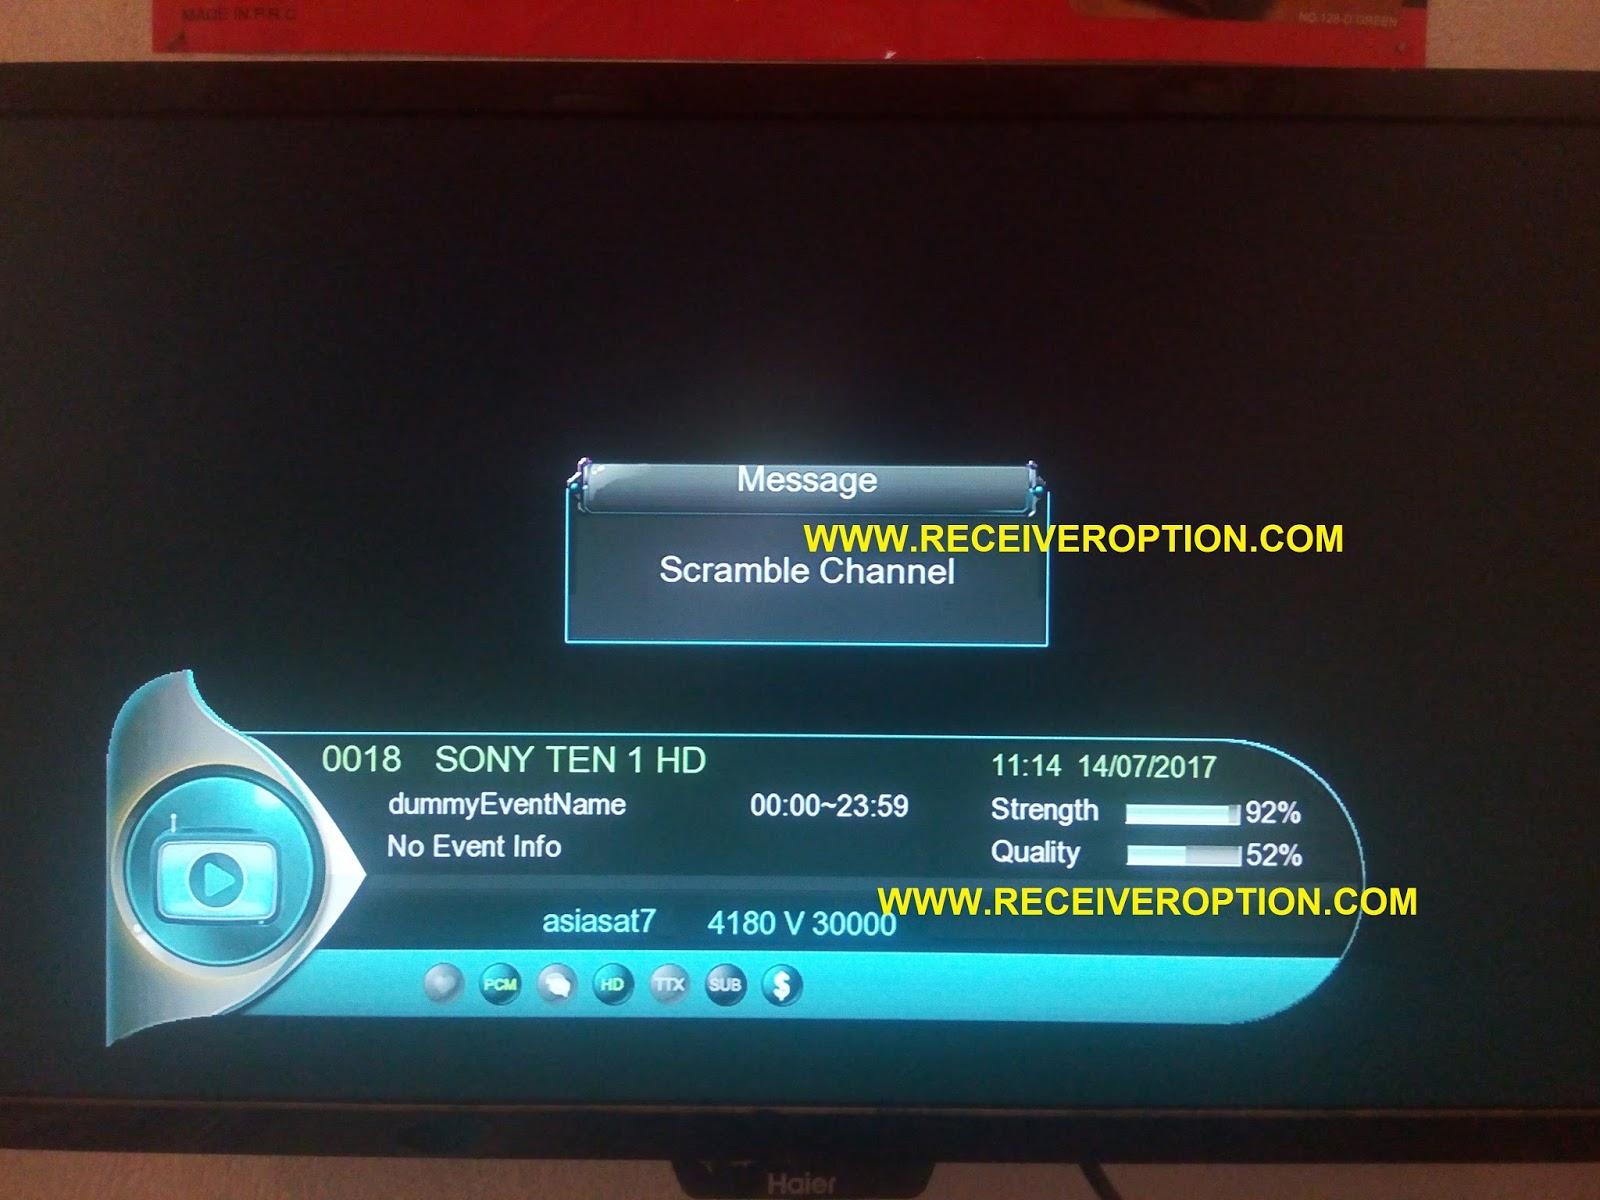 Smartcam (dishtv/videocon hd) - SatelliteTV Fans - IPTV Fans Club